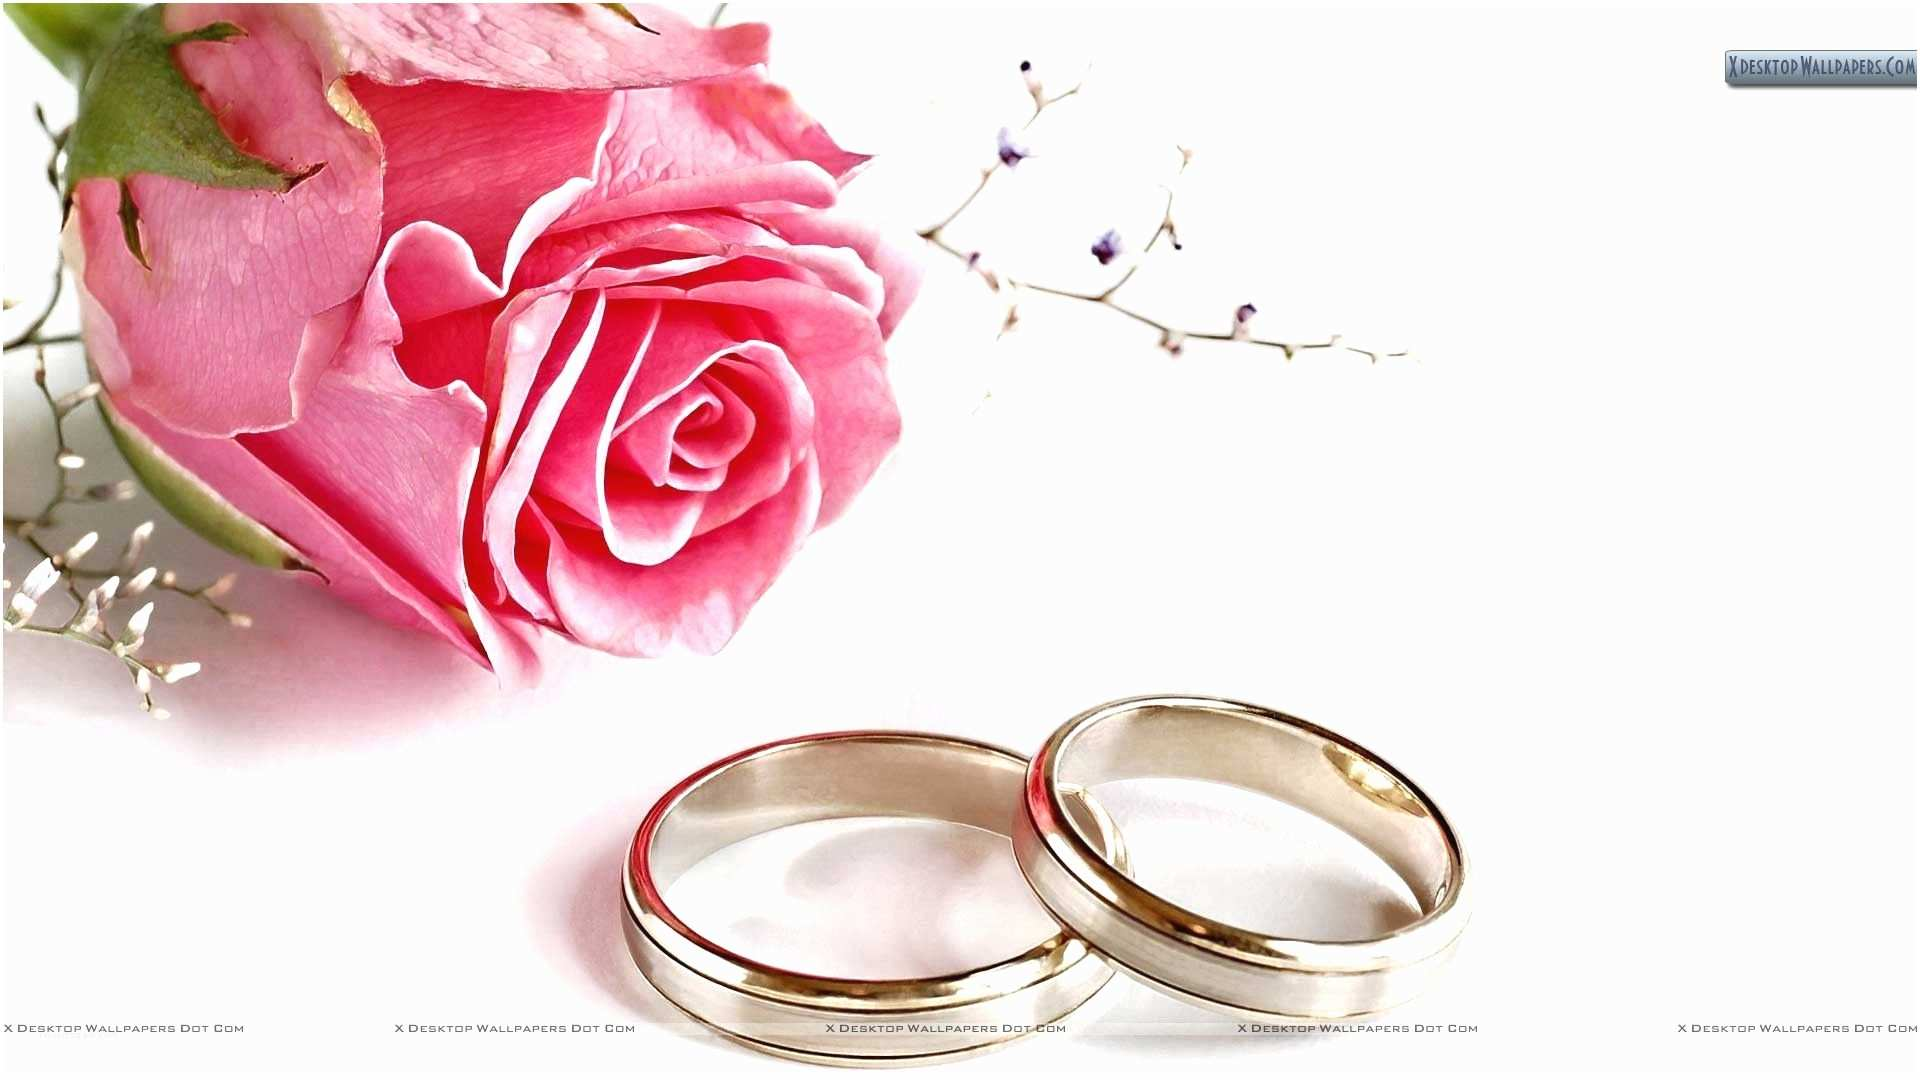 Wedding Invitation Pictures Background Image Wedding Invitation Background And Inspired